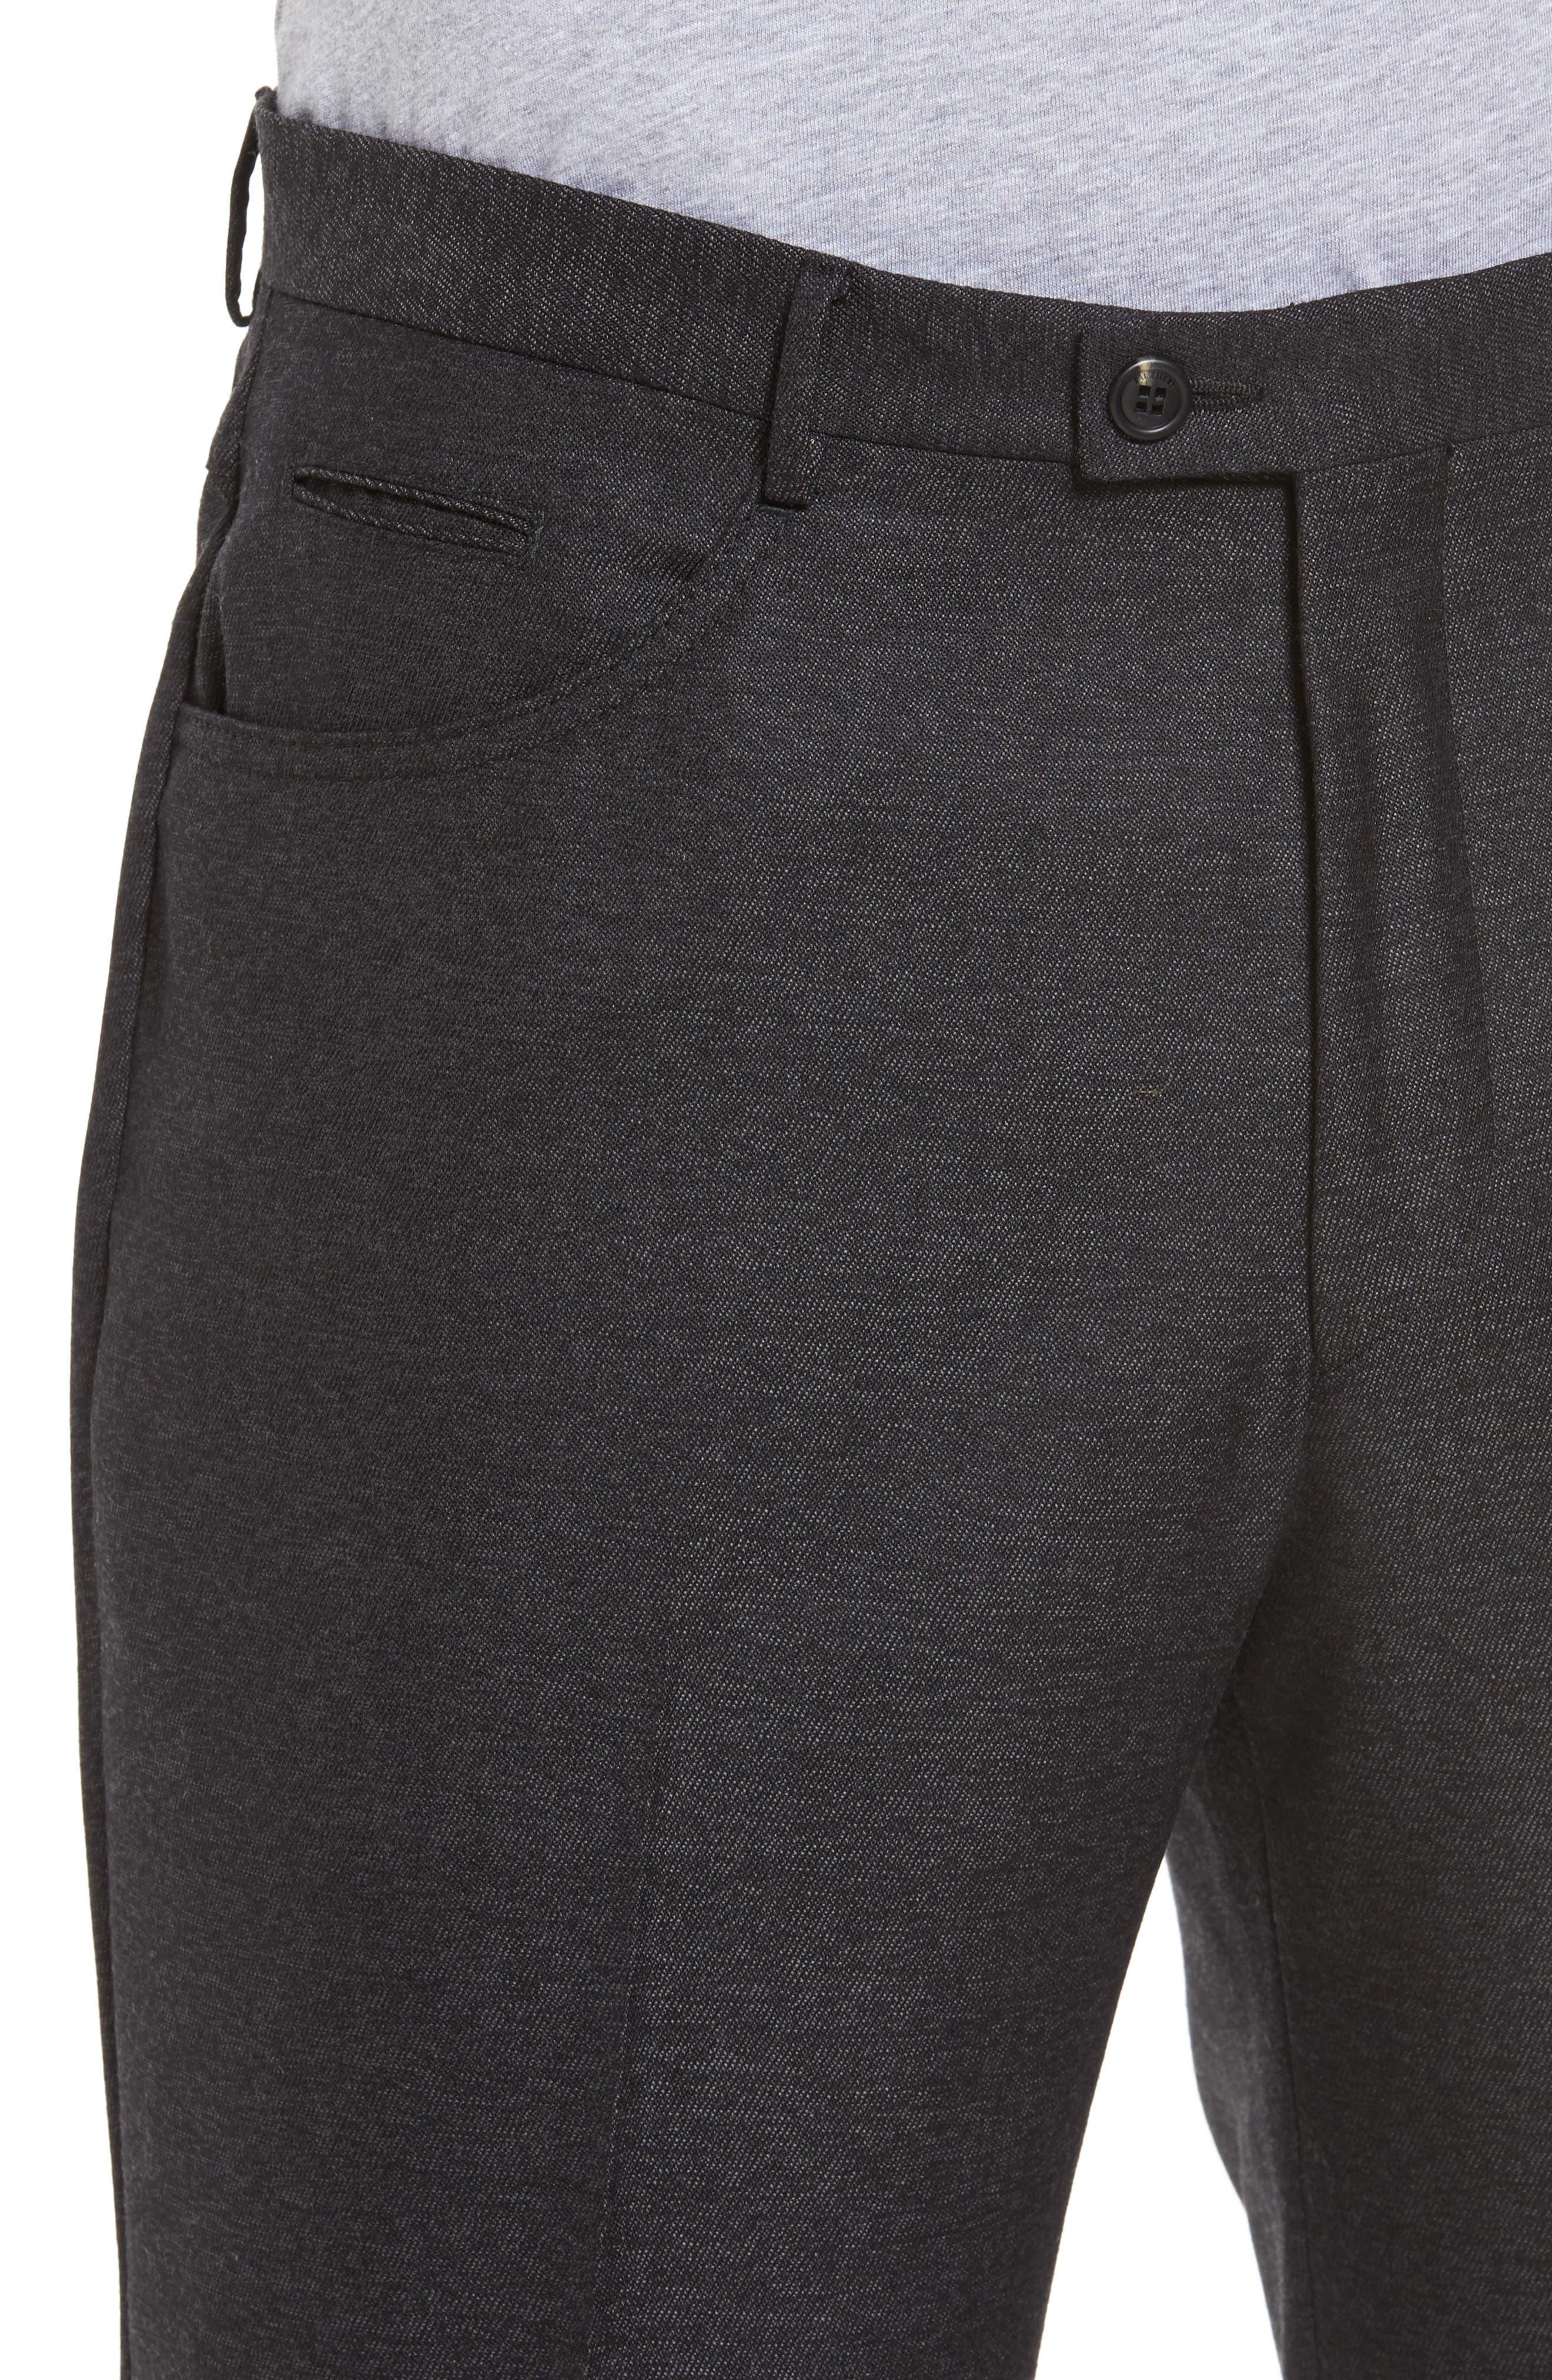 Sartorial Wool Five-Pocket Pants,                             Alternate thumbnail 4, color,                             001